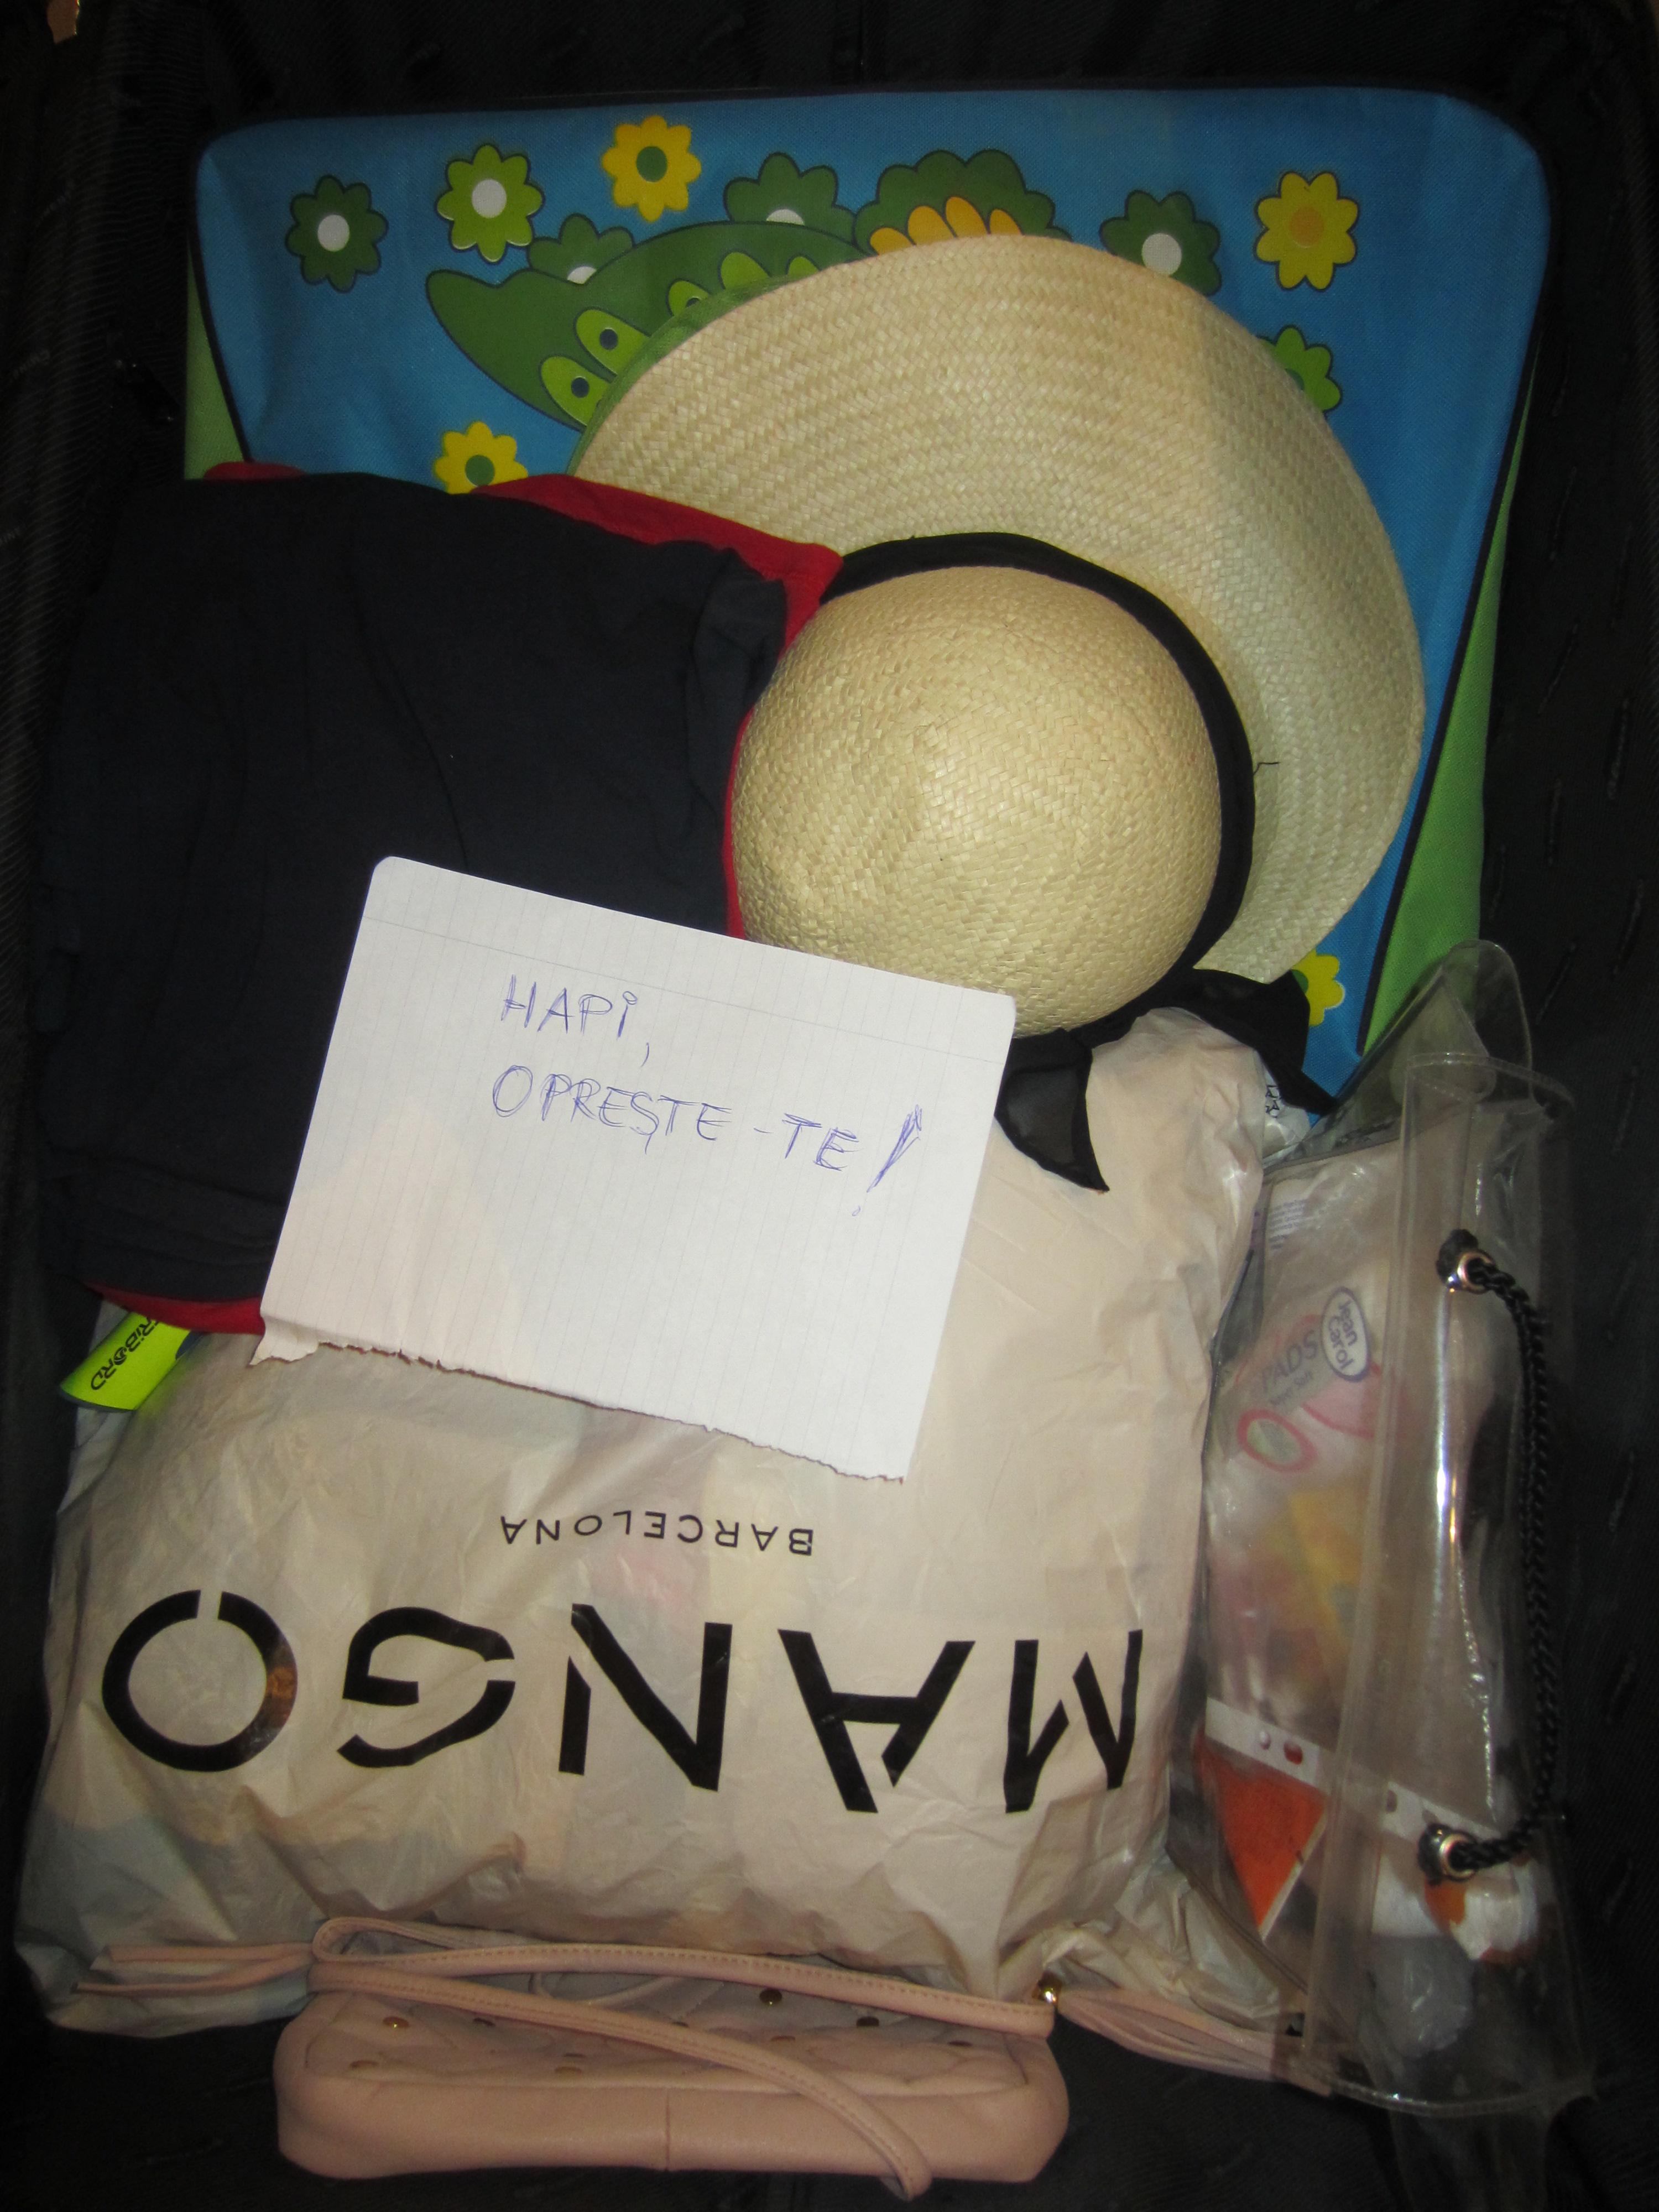 Imi fac bagajul